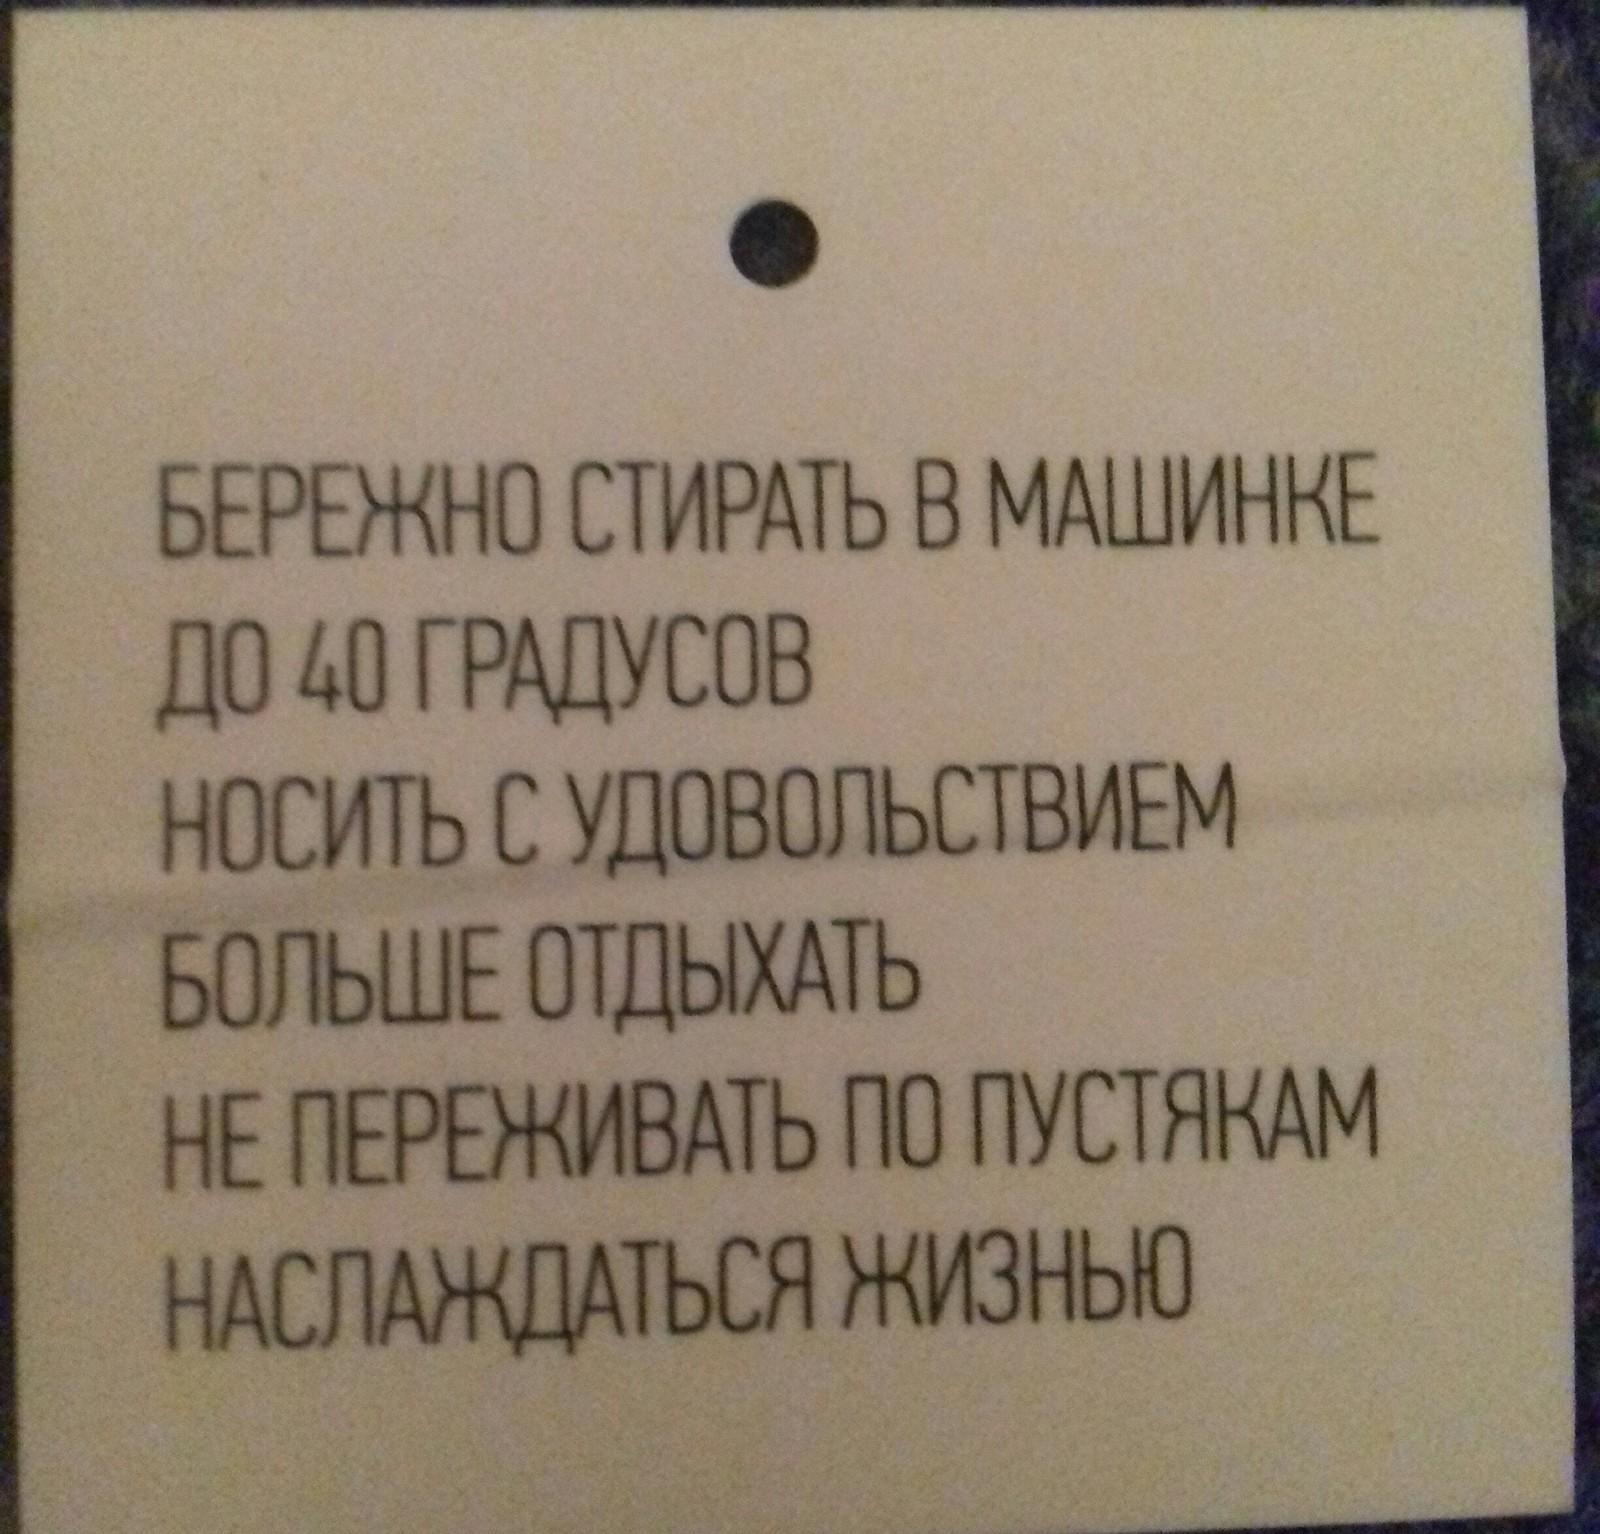 Совет от производителя )))